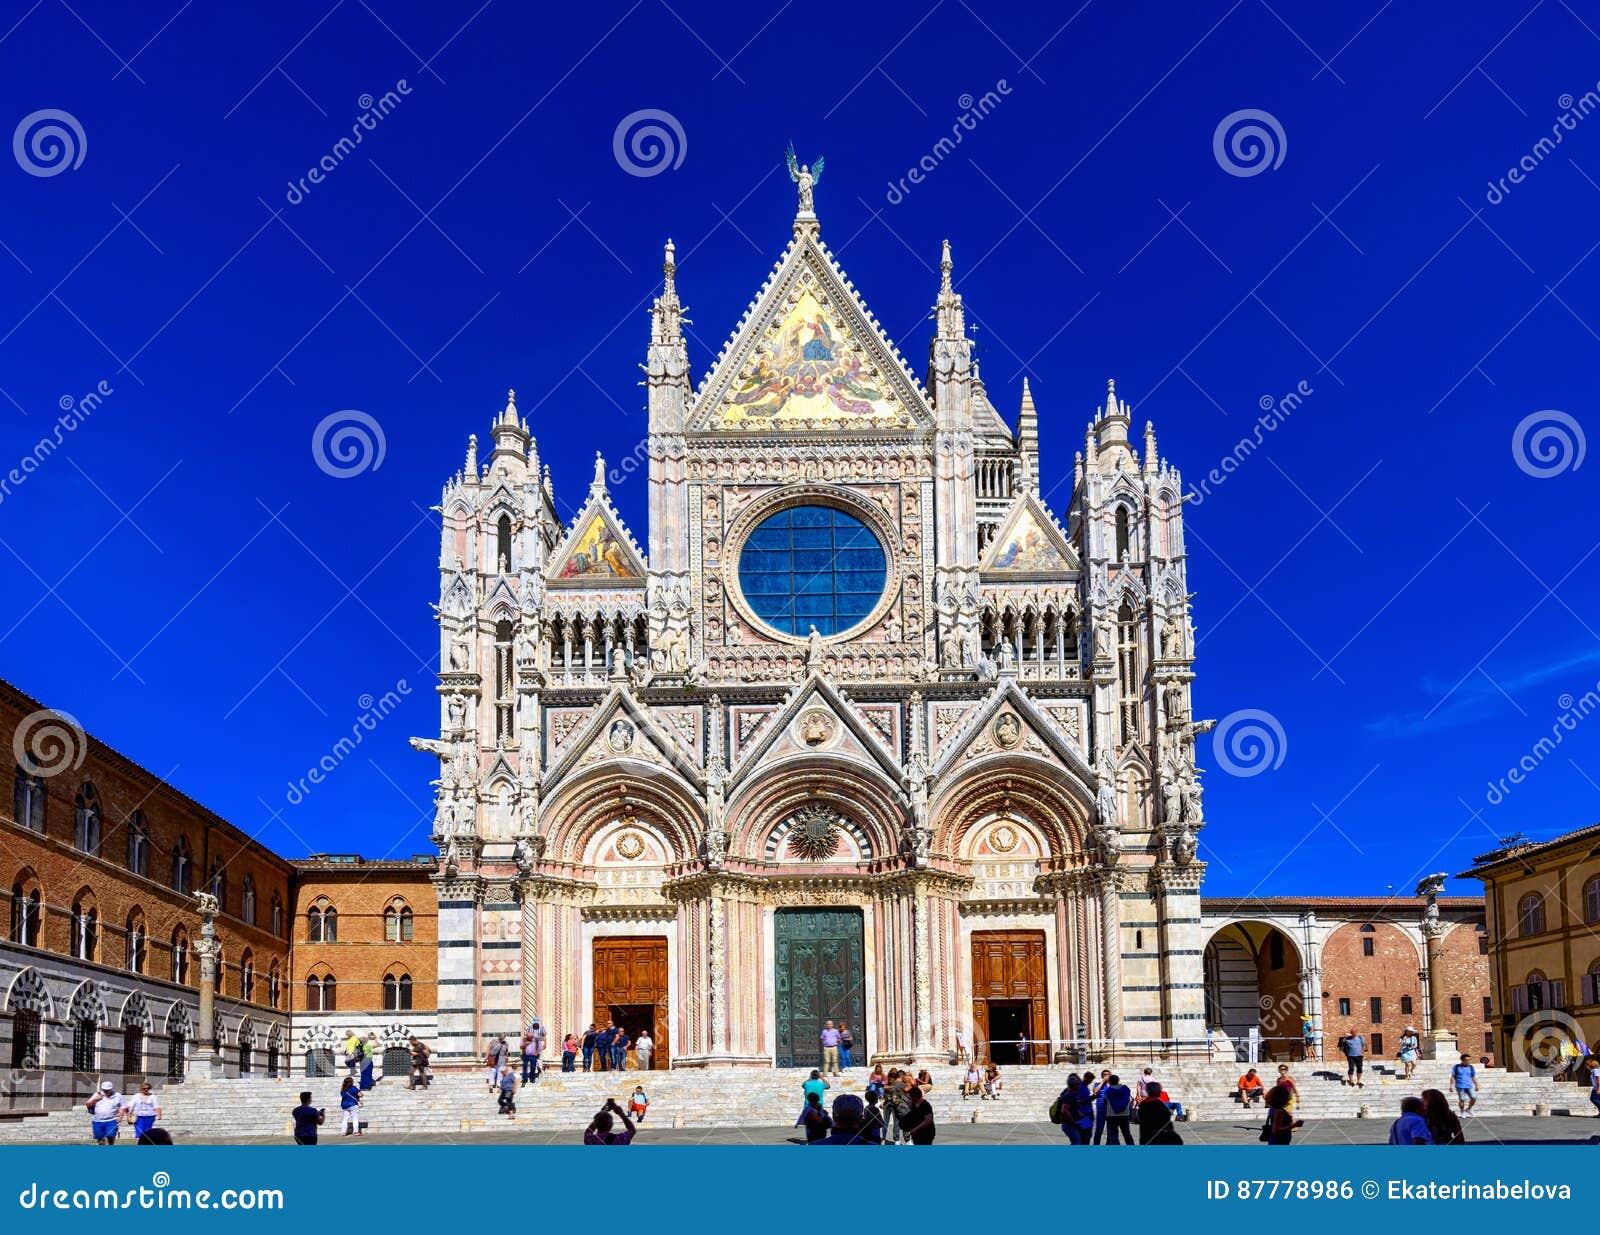 Siena Cathedral Santa Maria Assunta Duomo Di Siena In ...